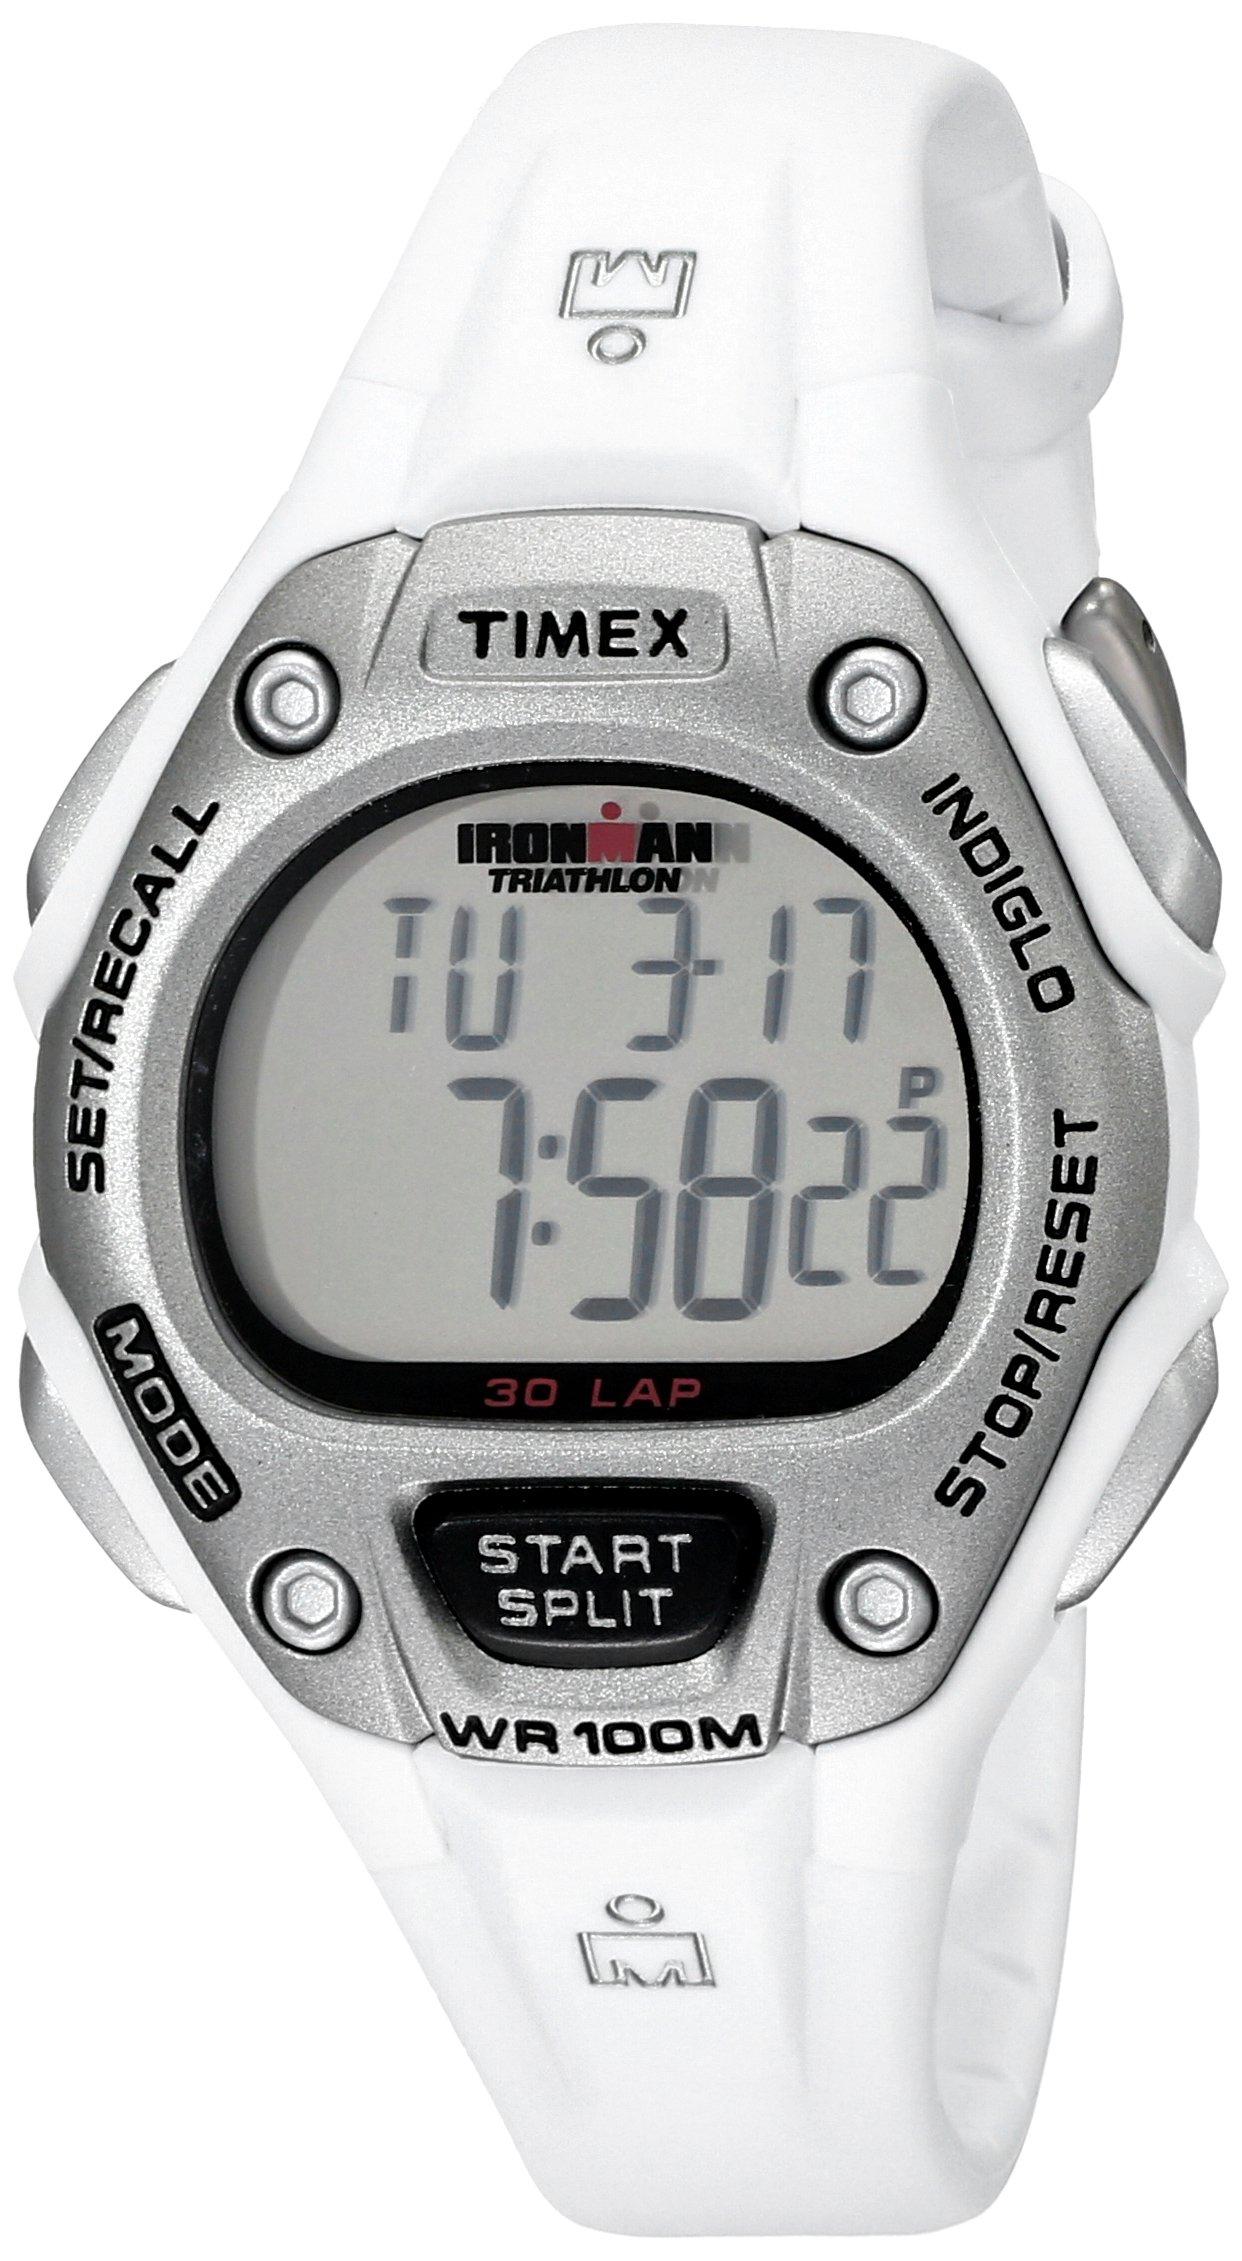 Timex Women's Ironman Classic 30 Mid-Size Watch